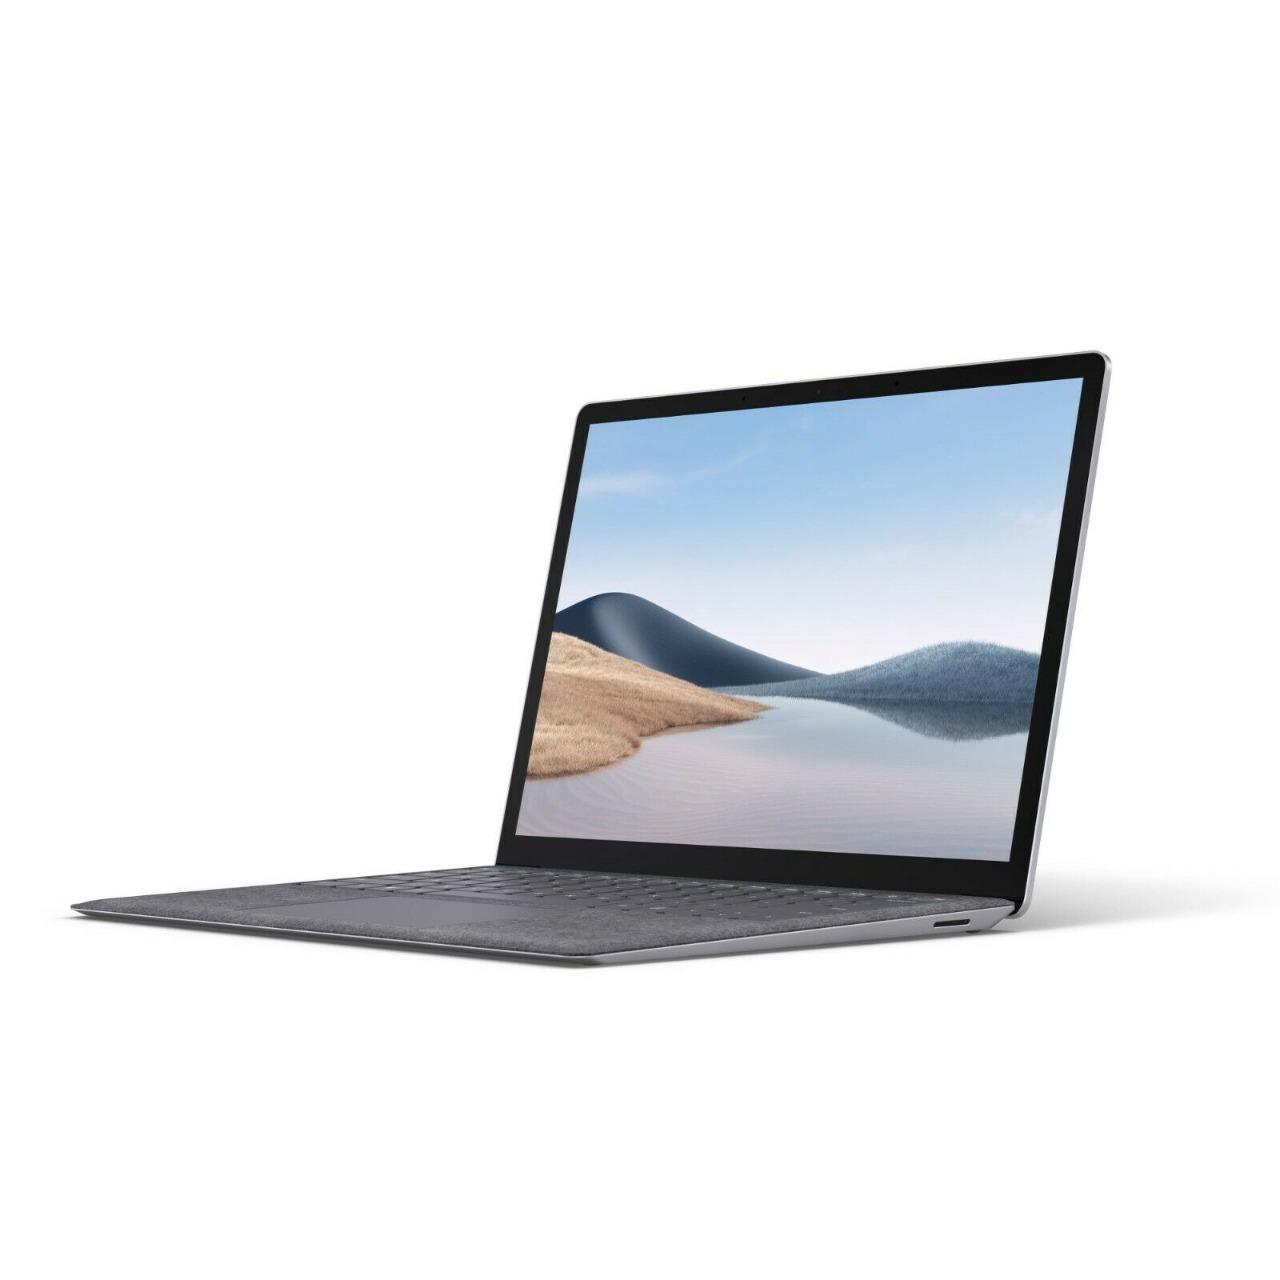 Microsoft Surface Laptop 4 13.5 Core i7 16GB RAM 512GB SSD Platinum